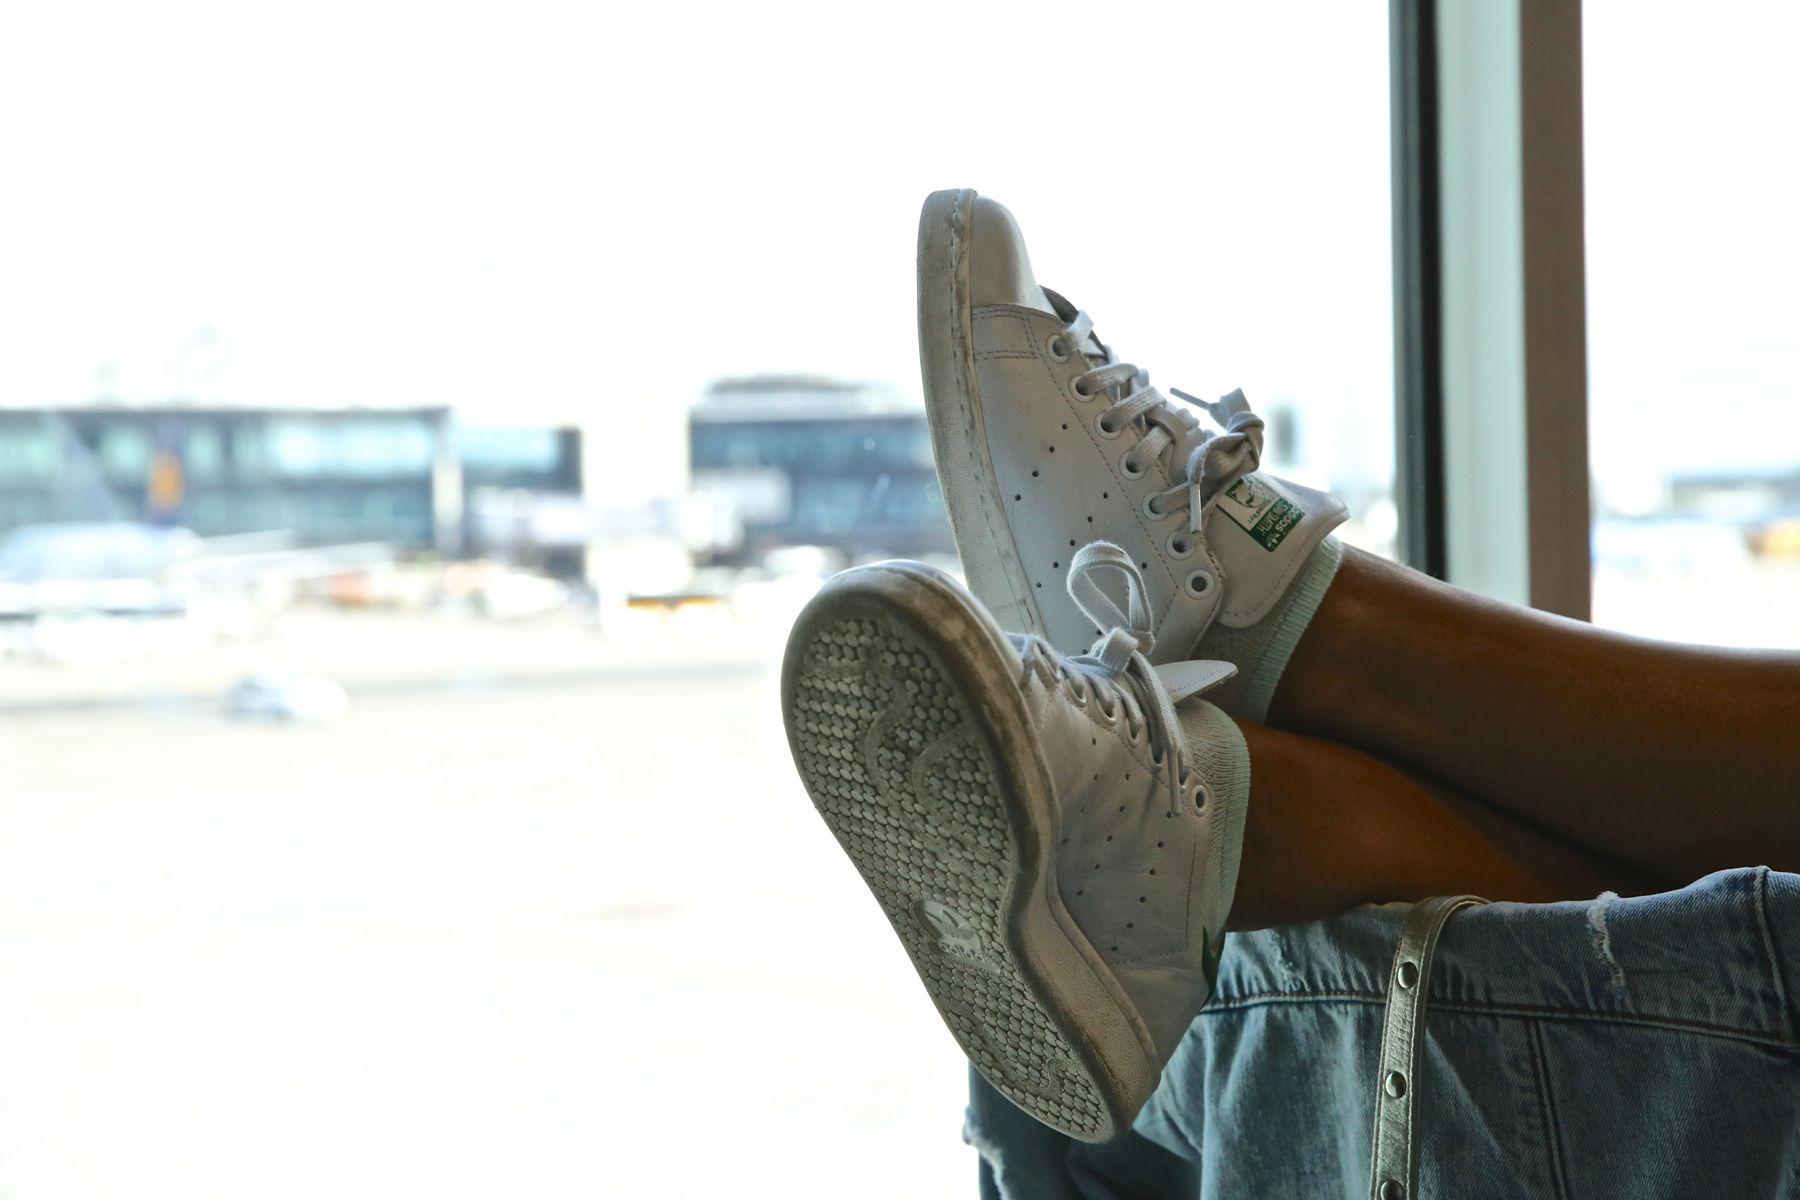 trendy_taste-look-outfit-street_style-ootd-blog-blogger-fashion_spain-moda_españa-traveling-viaje-frankfurt-stan_smith-adidas-lentejuelas-top-denim-shorts-vaqueros_rotos-3